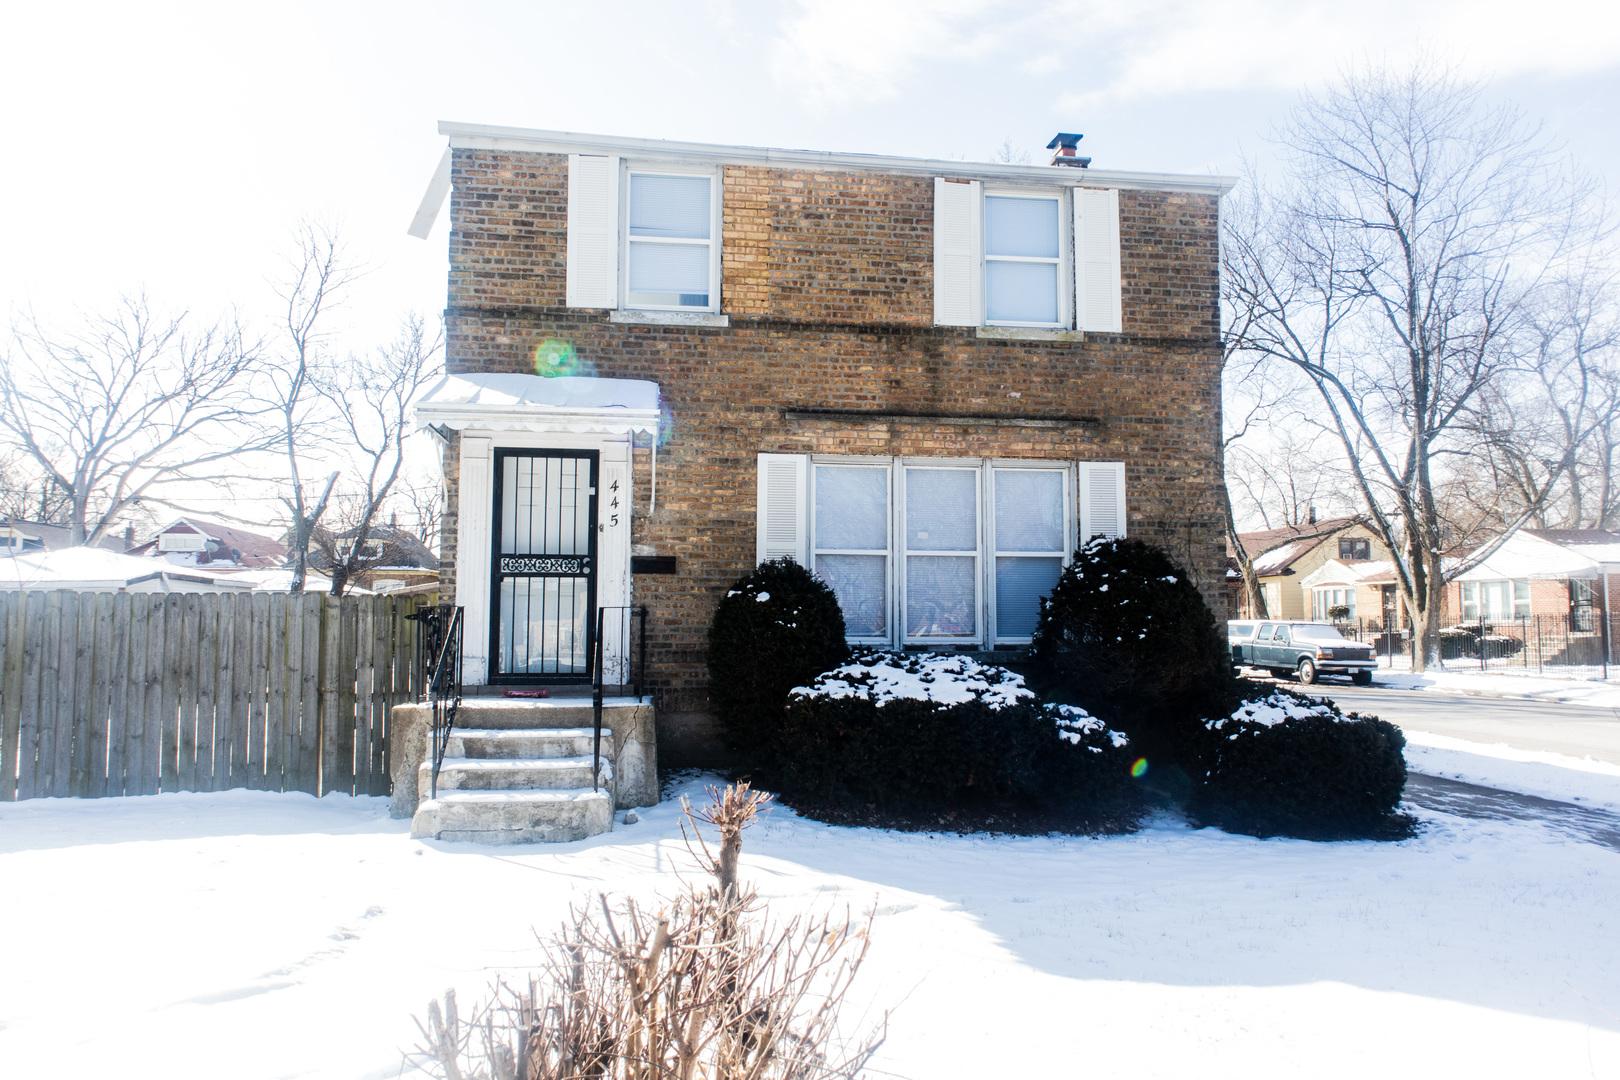 445 W 100th Place, Chicago IL 60628